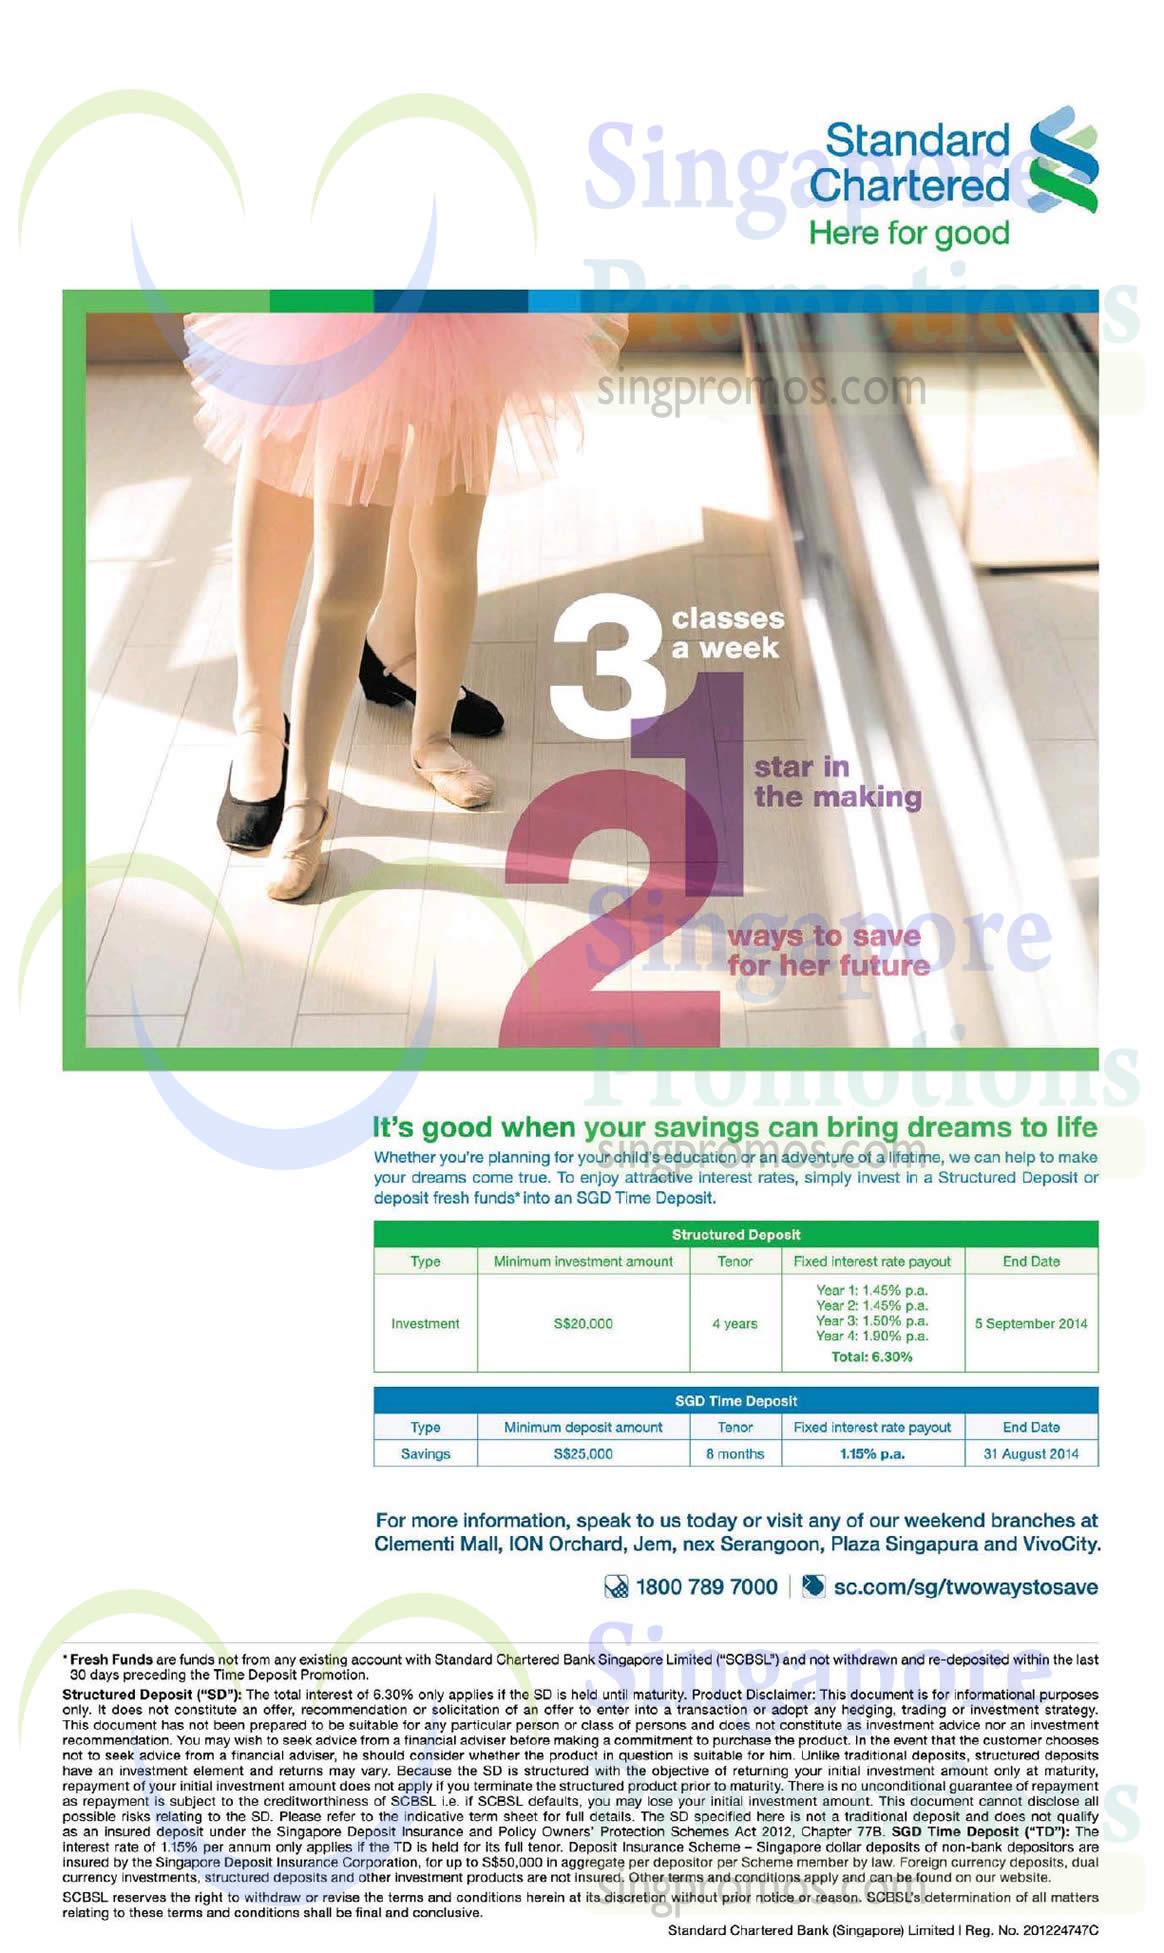 22 Aug Structured Deposit, SGD Time Deposit